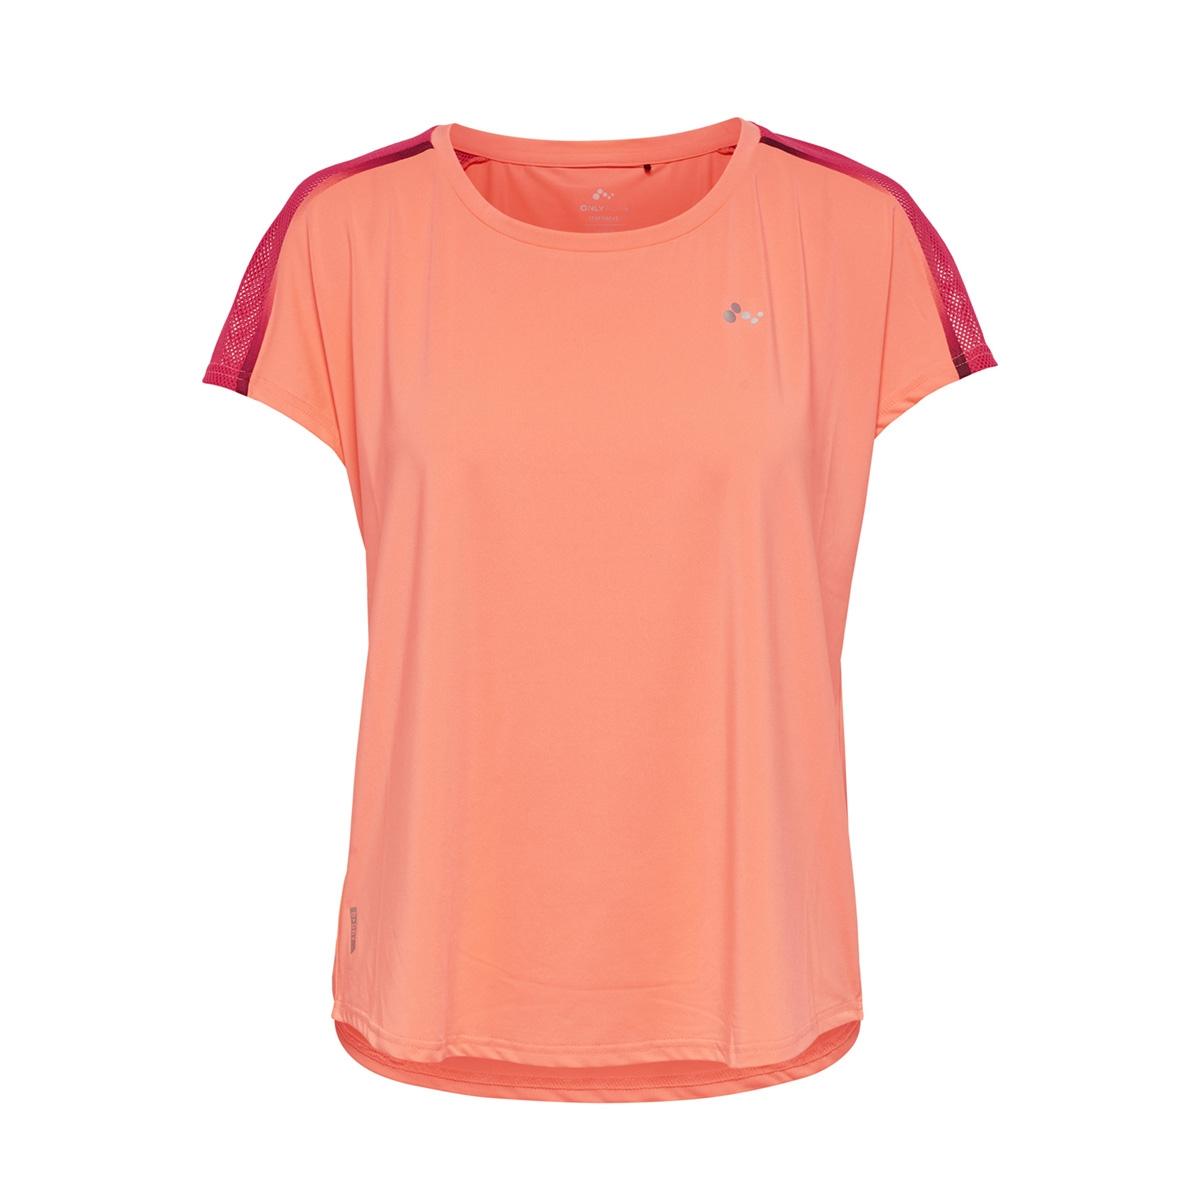 onpcalexia loose training ss tee 15165446 only play sport shirt neon orange/w. paradis